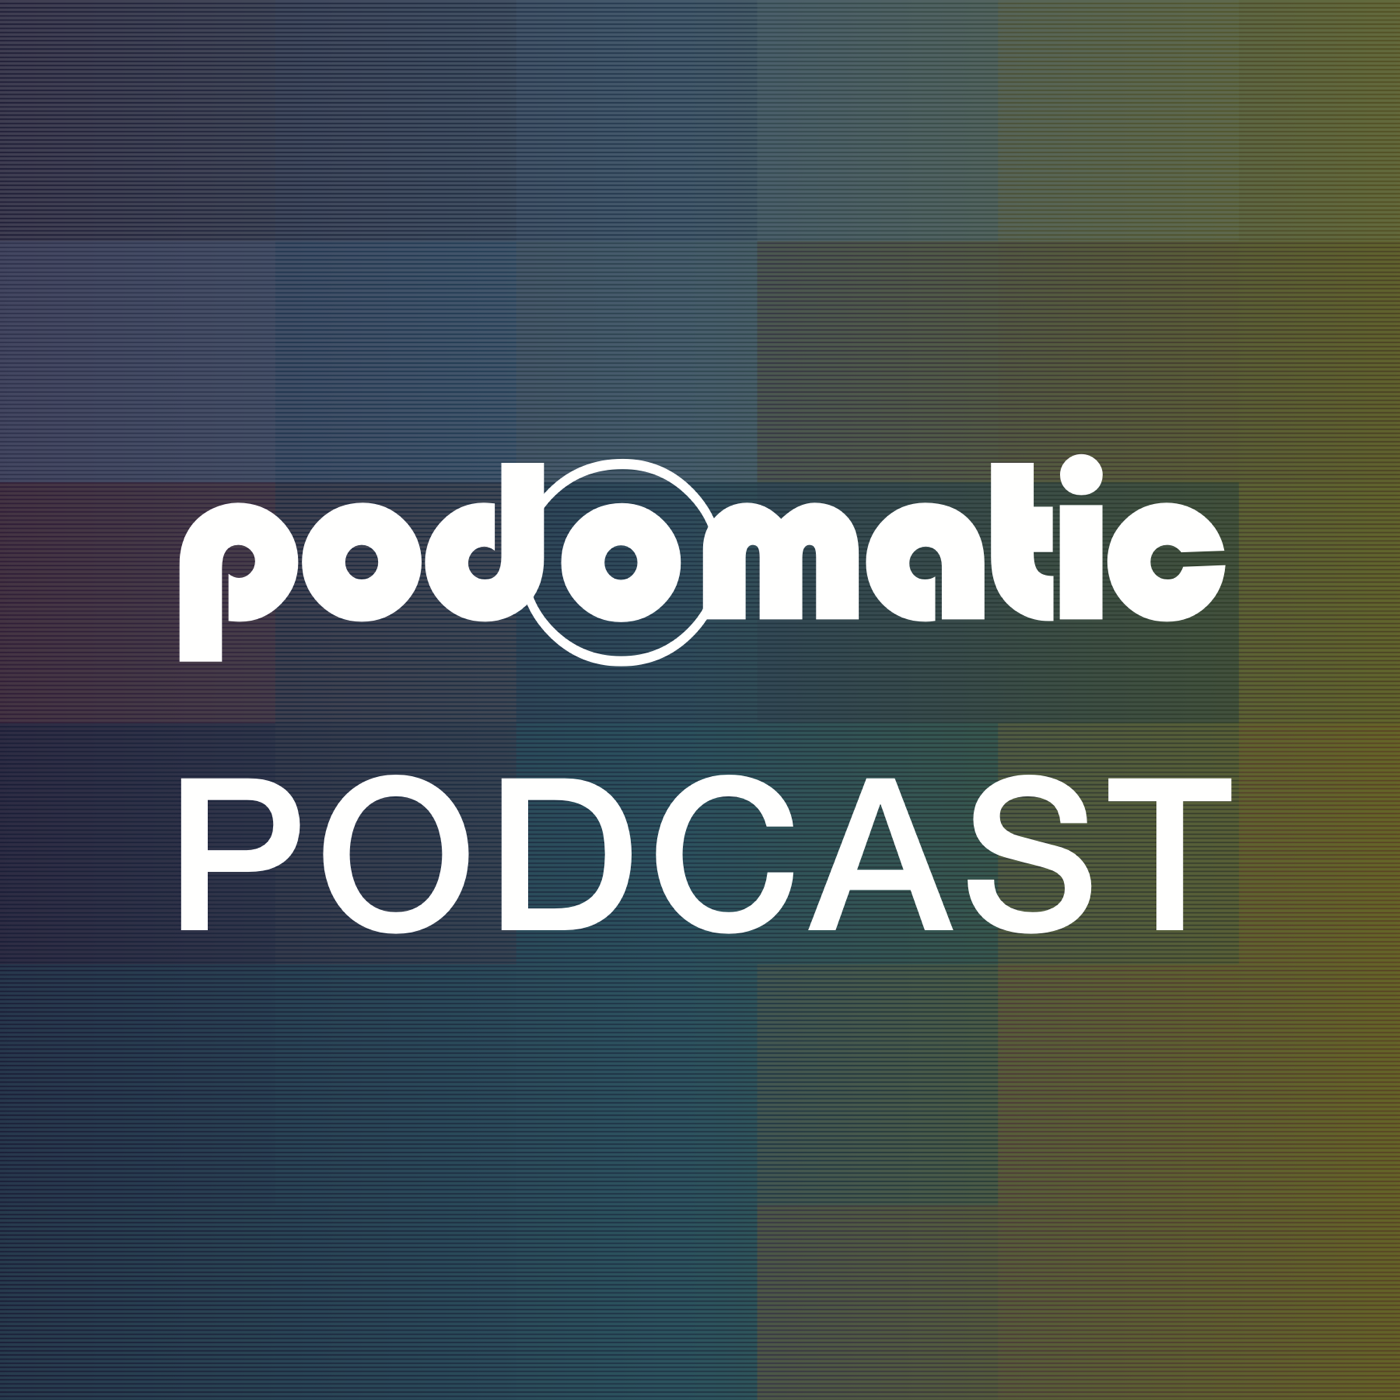 harish's Podcast